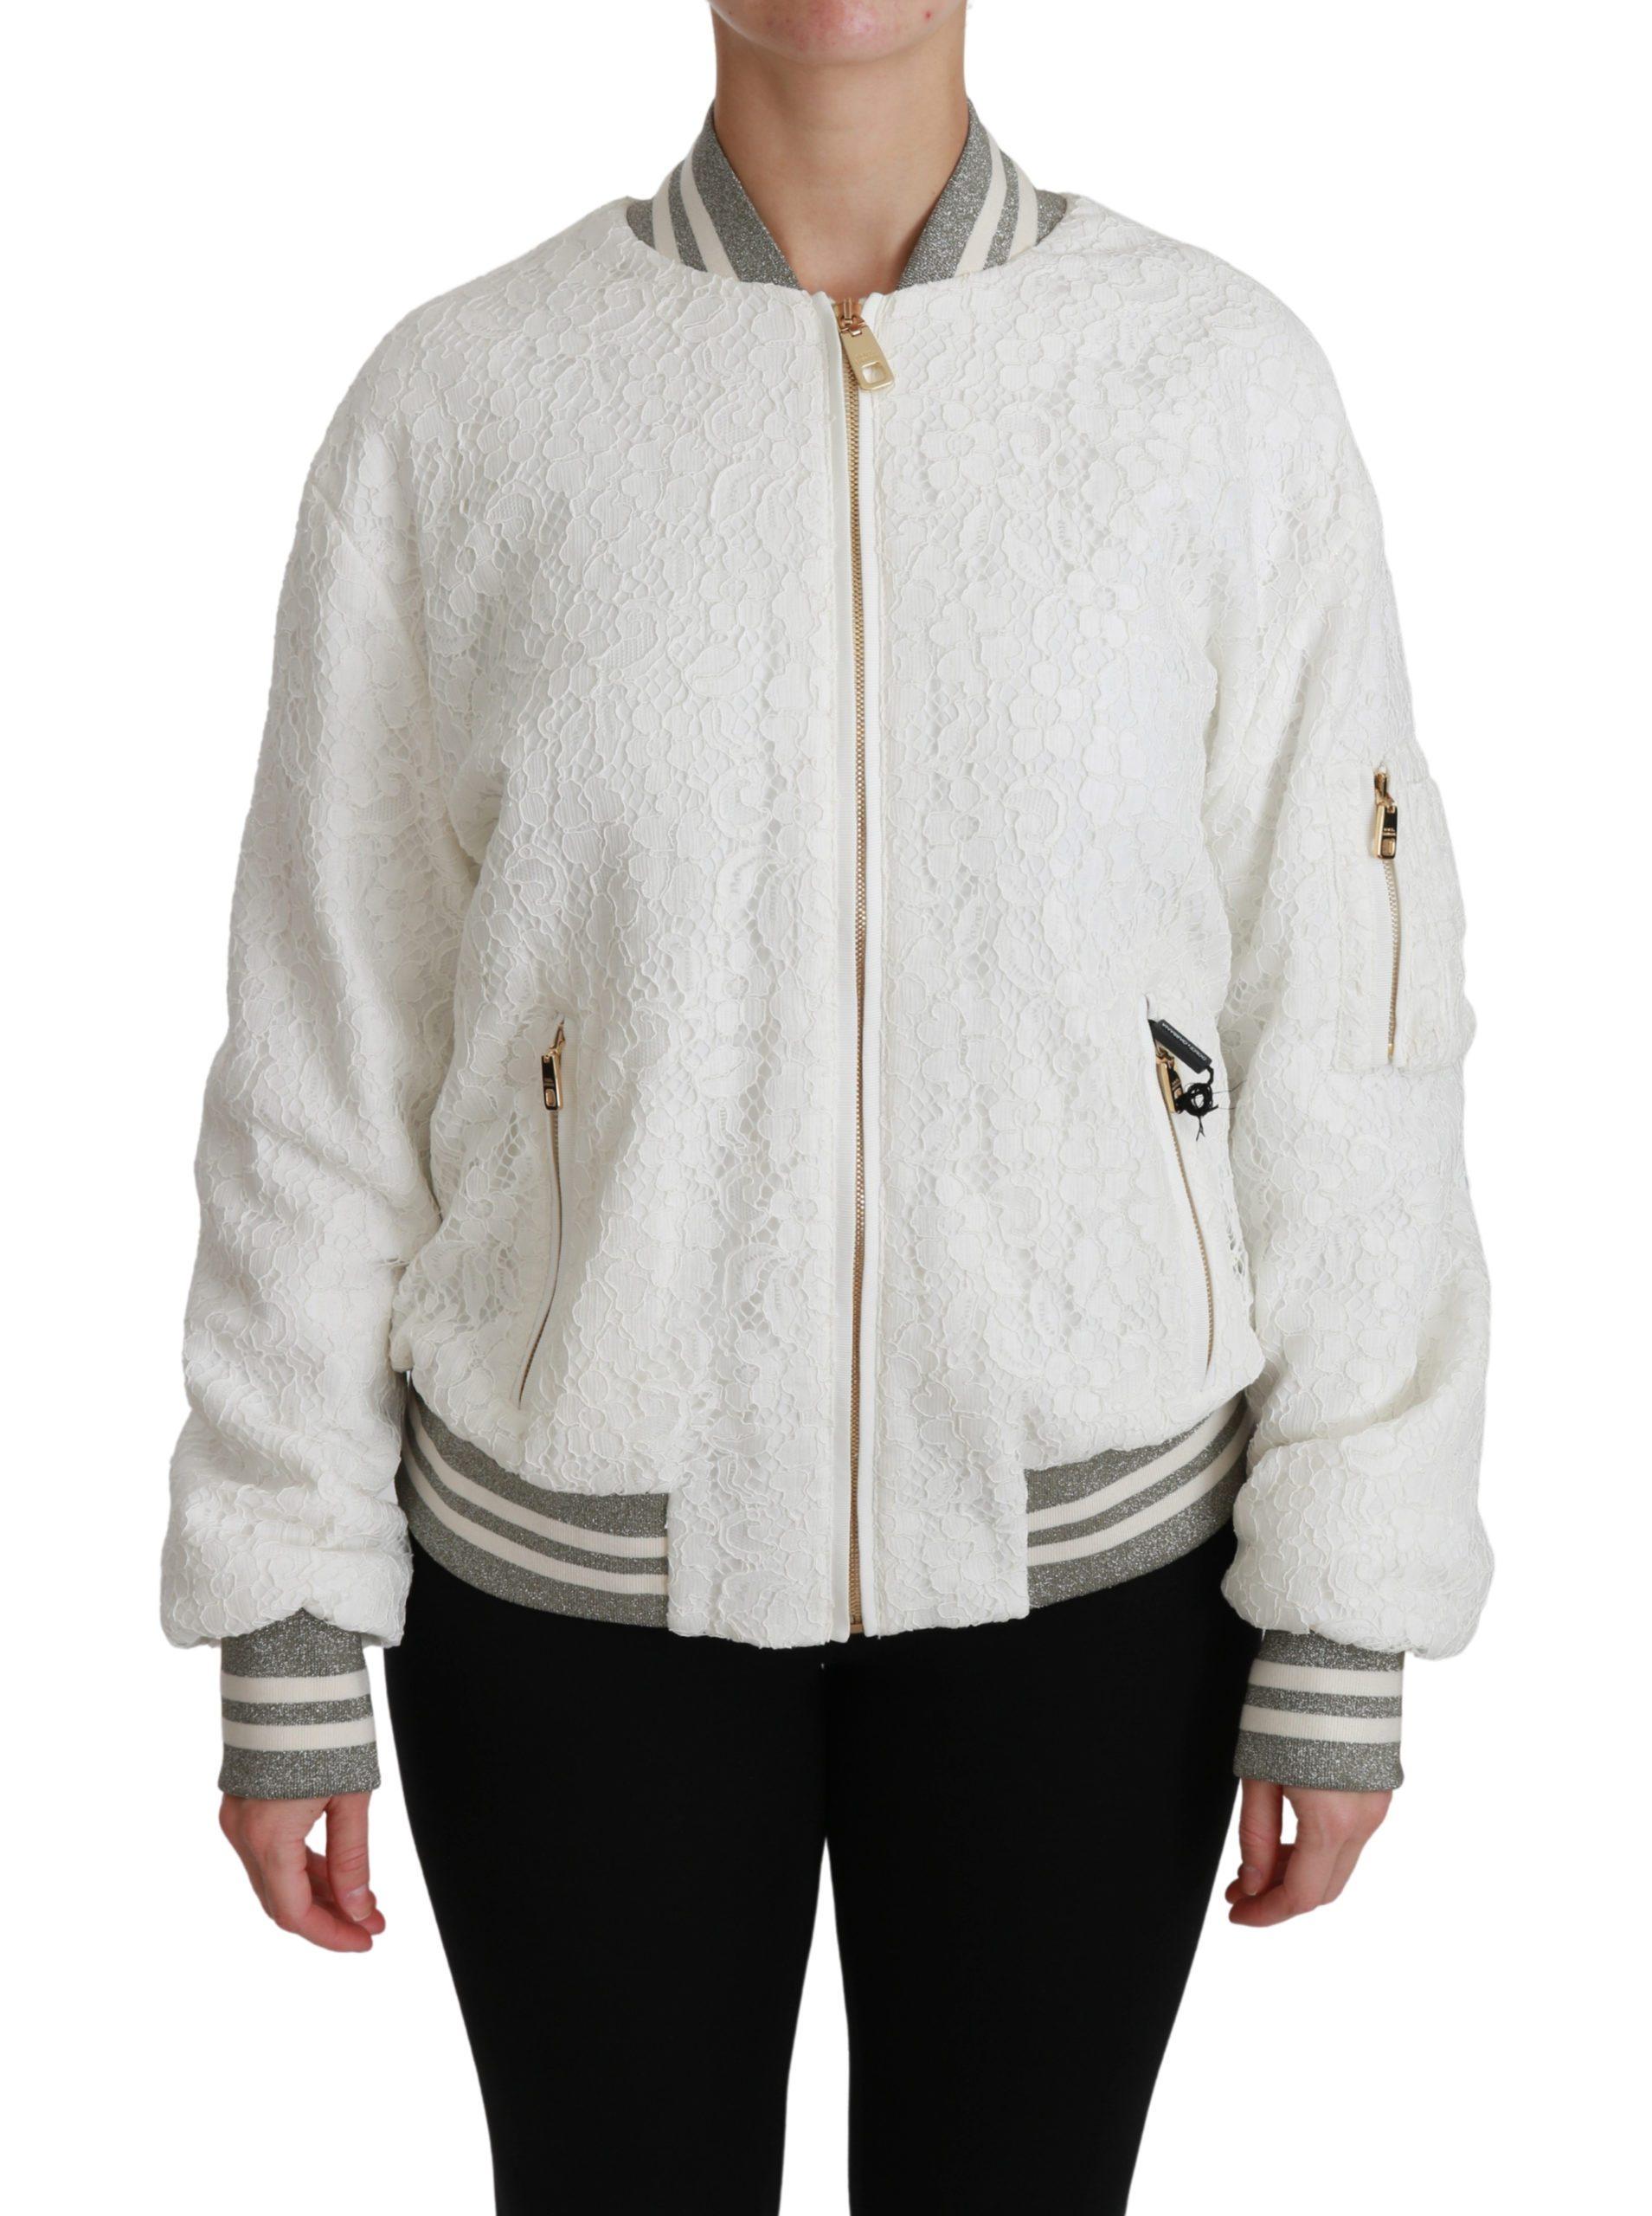 Dolce & Gabbana Women's Lace Full Zip Bomber Cotton Jacket White JKT2557 - IT40|S